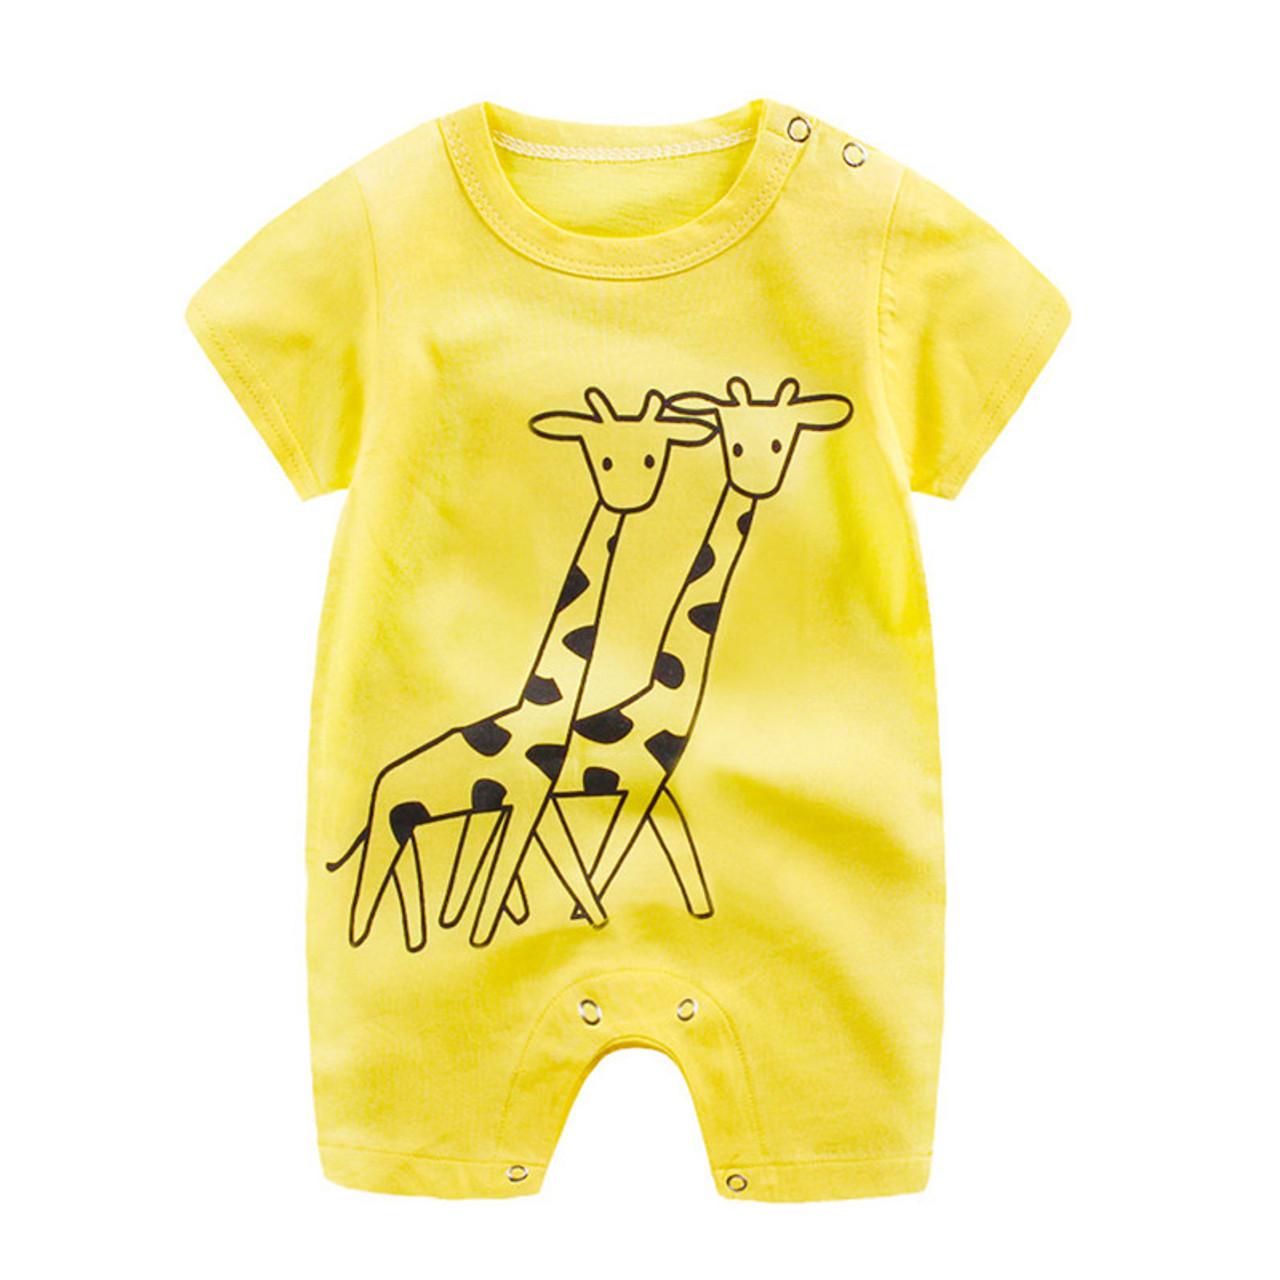 Diamondo Summer Cartoon Letters Print Baby Rompers Boys Short Sleeve Soft Jumpsuit